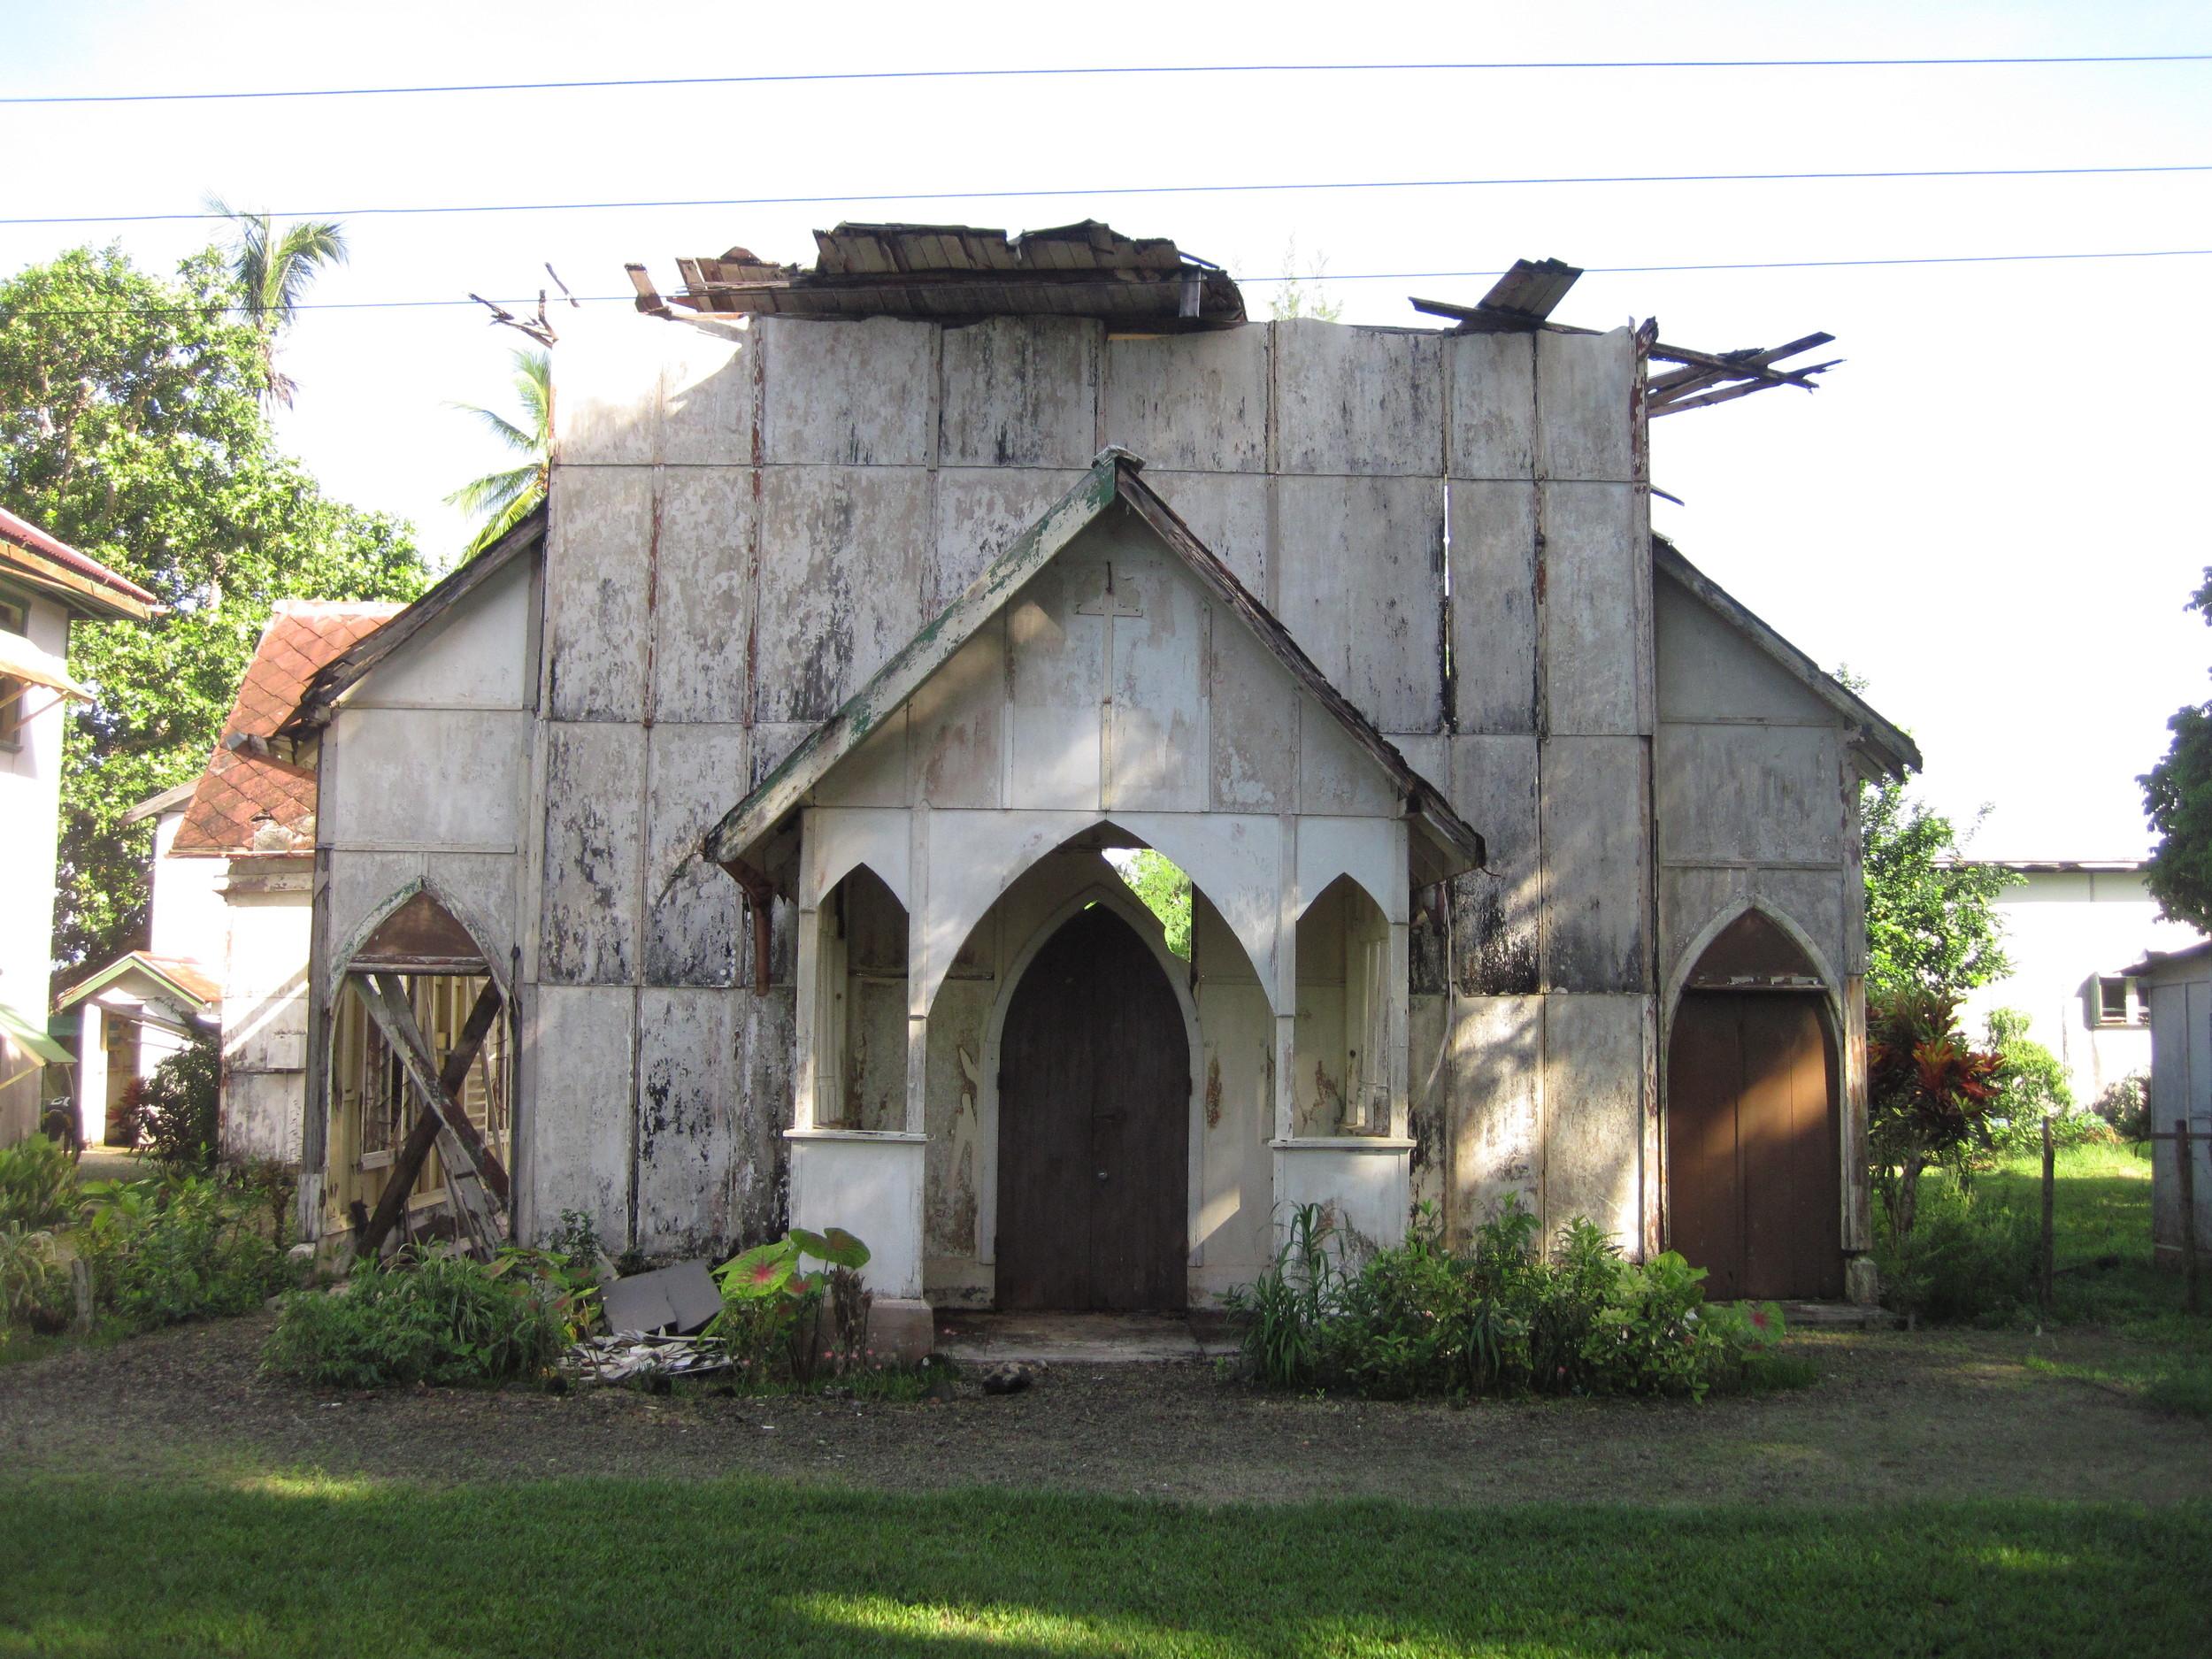 Exterior of the church 2013 - photo Mick Fogg